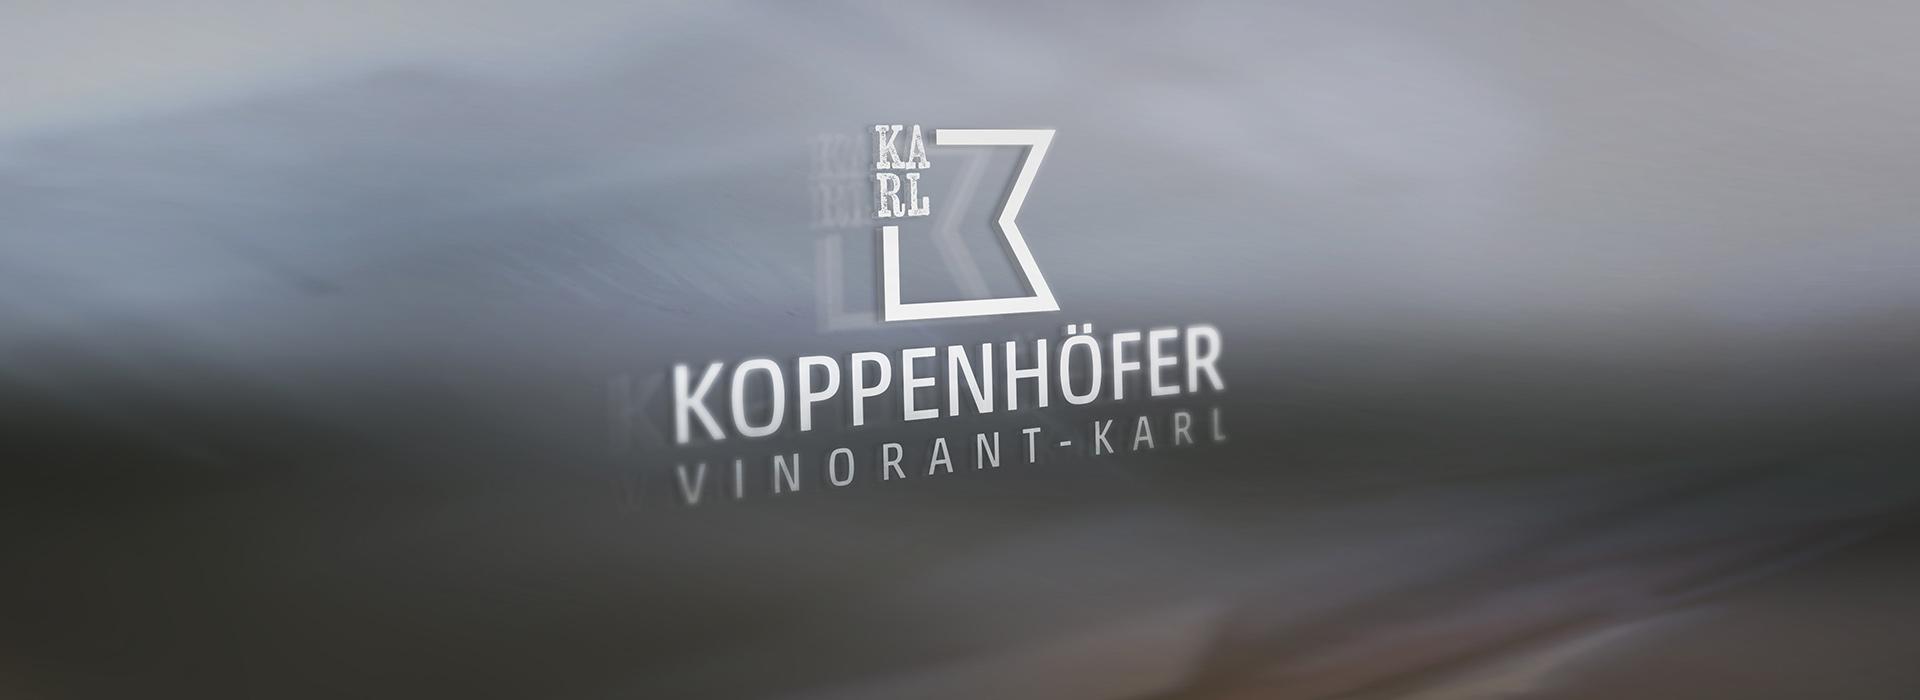 Logo Vinorant Karl